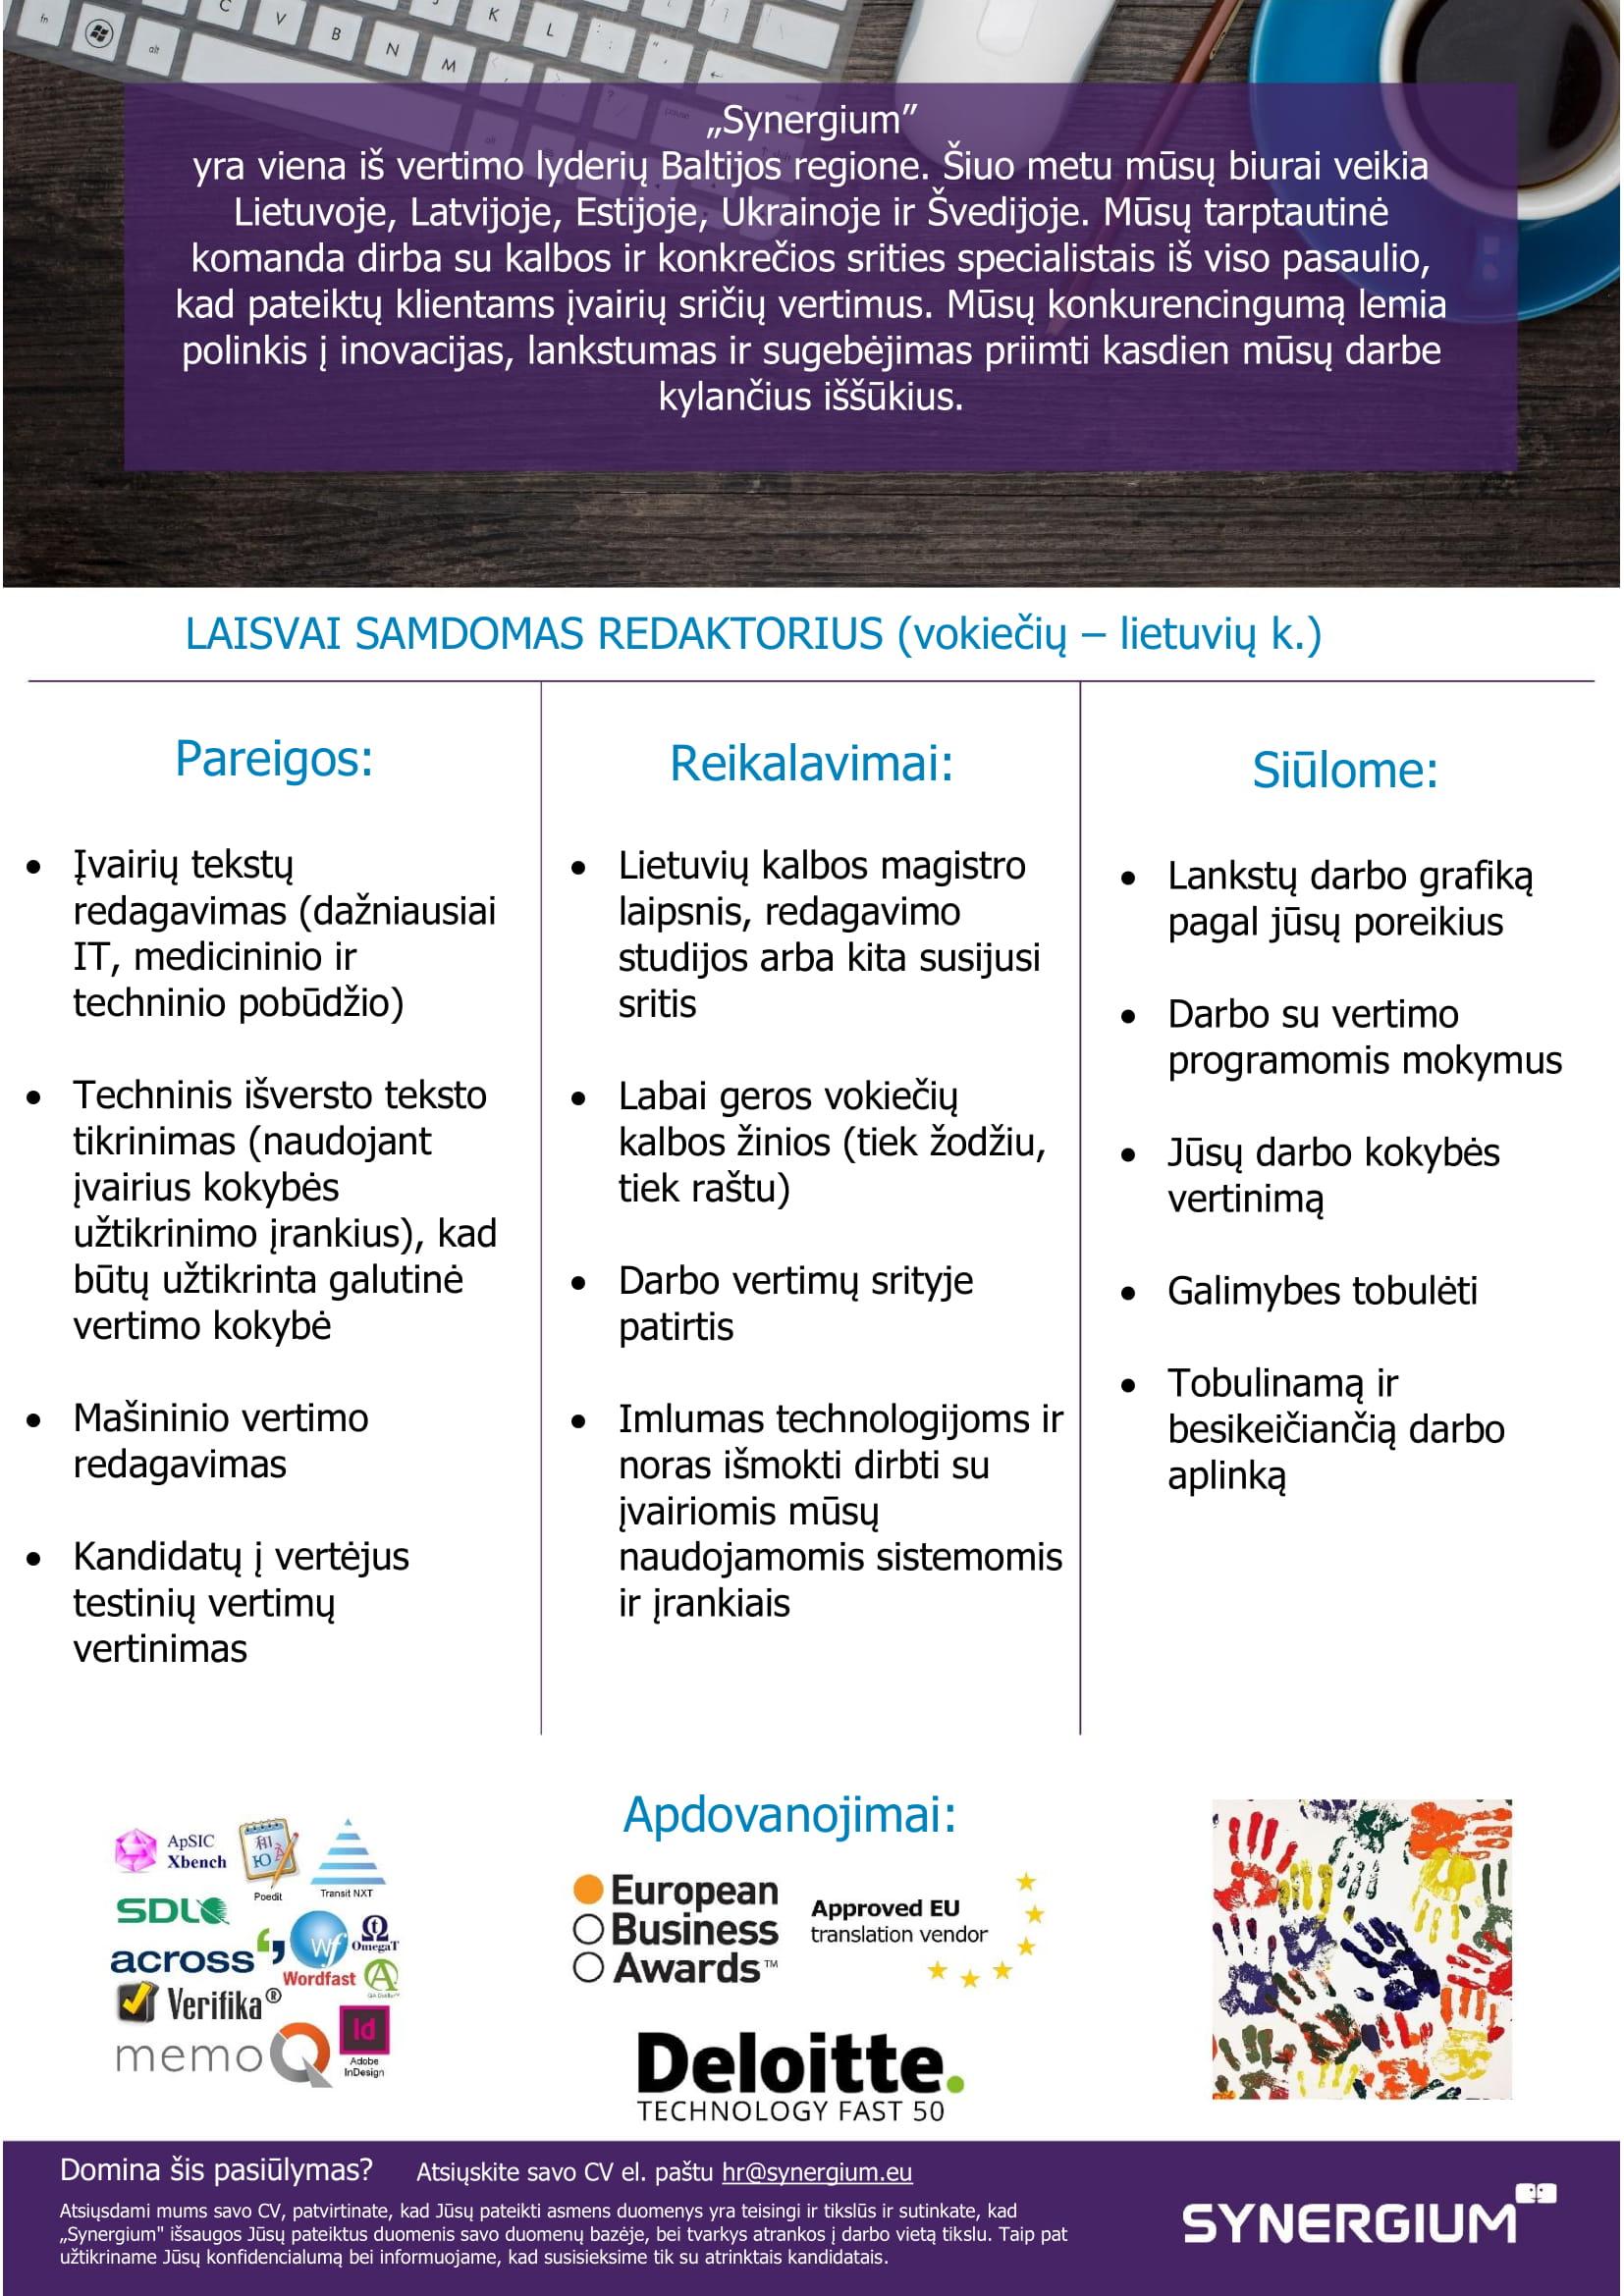 Synergium junior project coordinator job advertisement